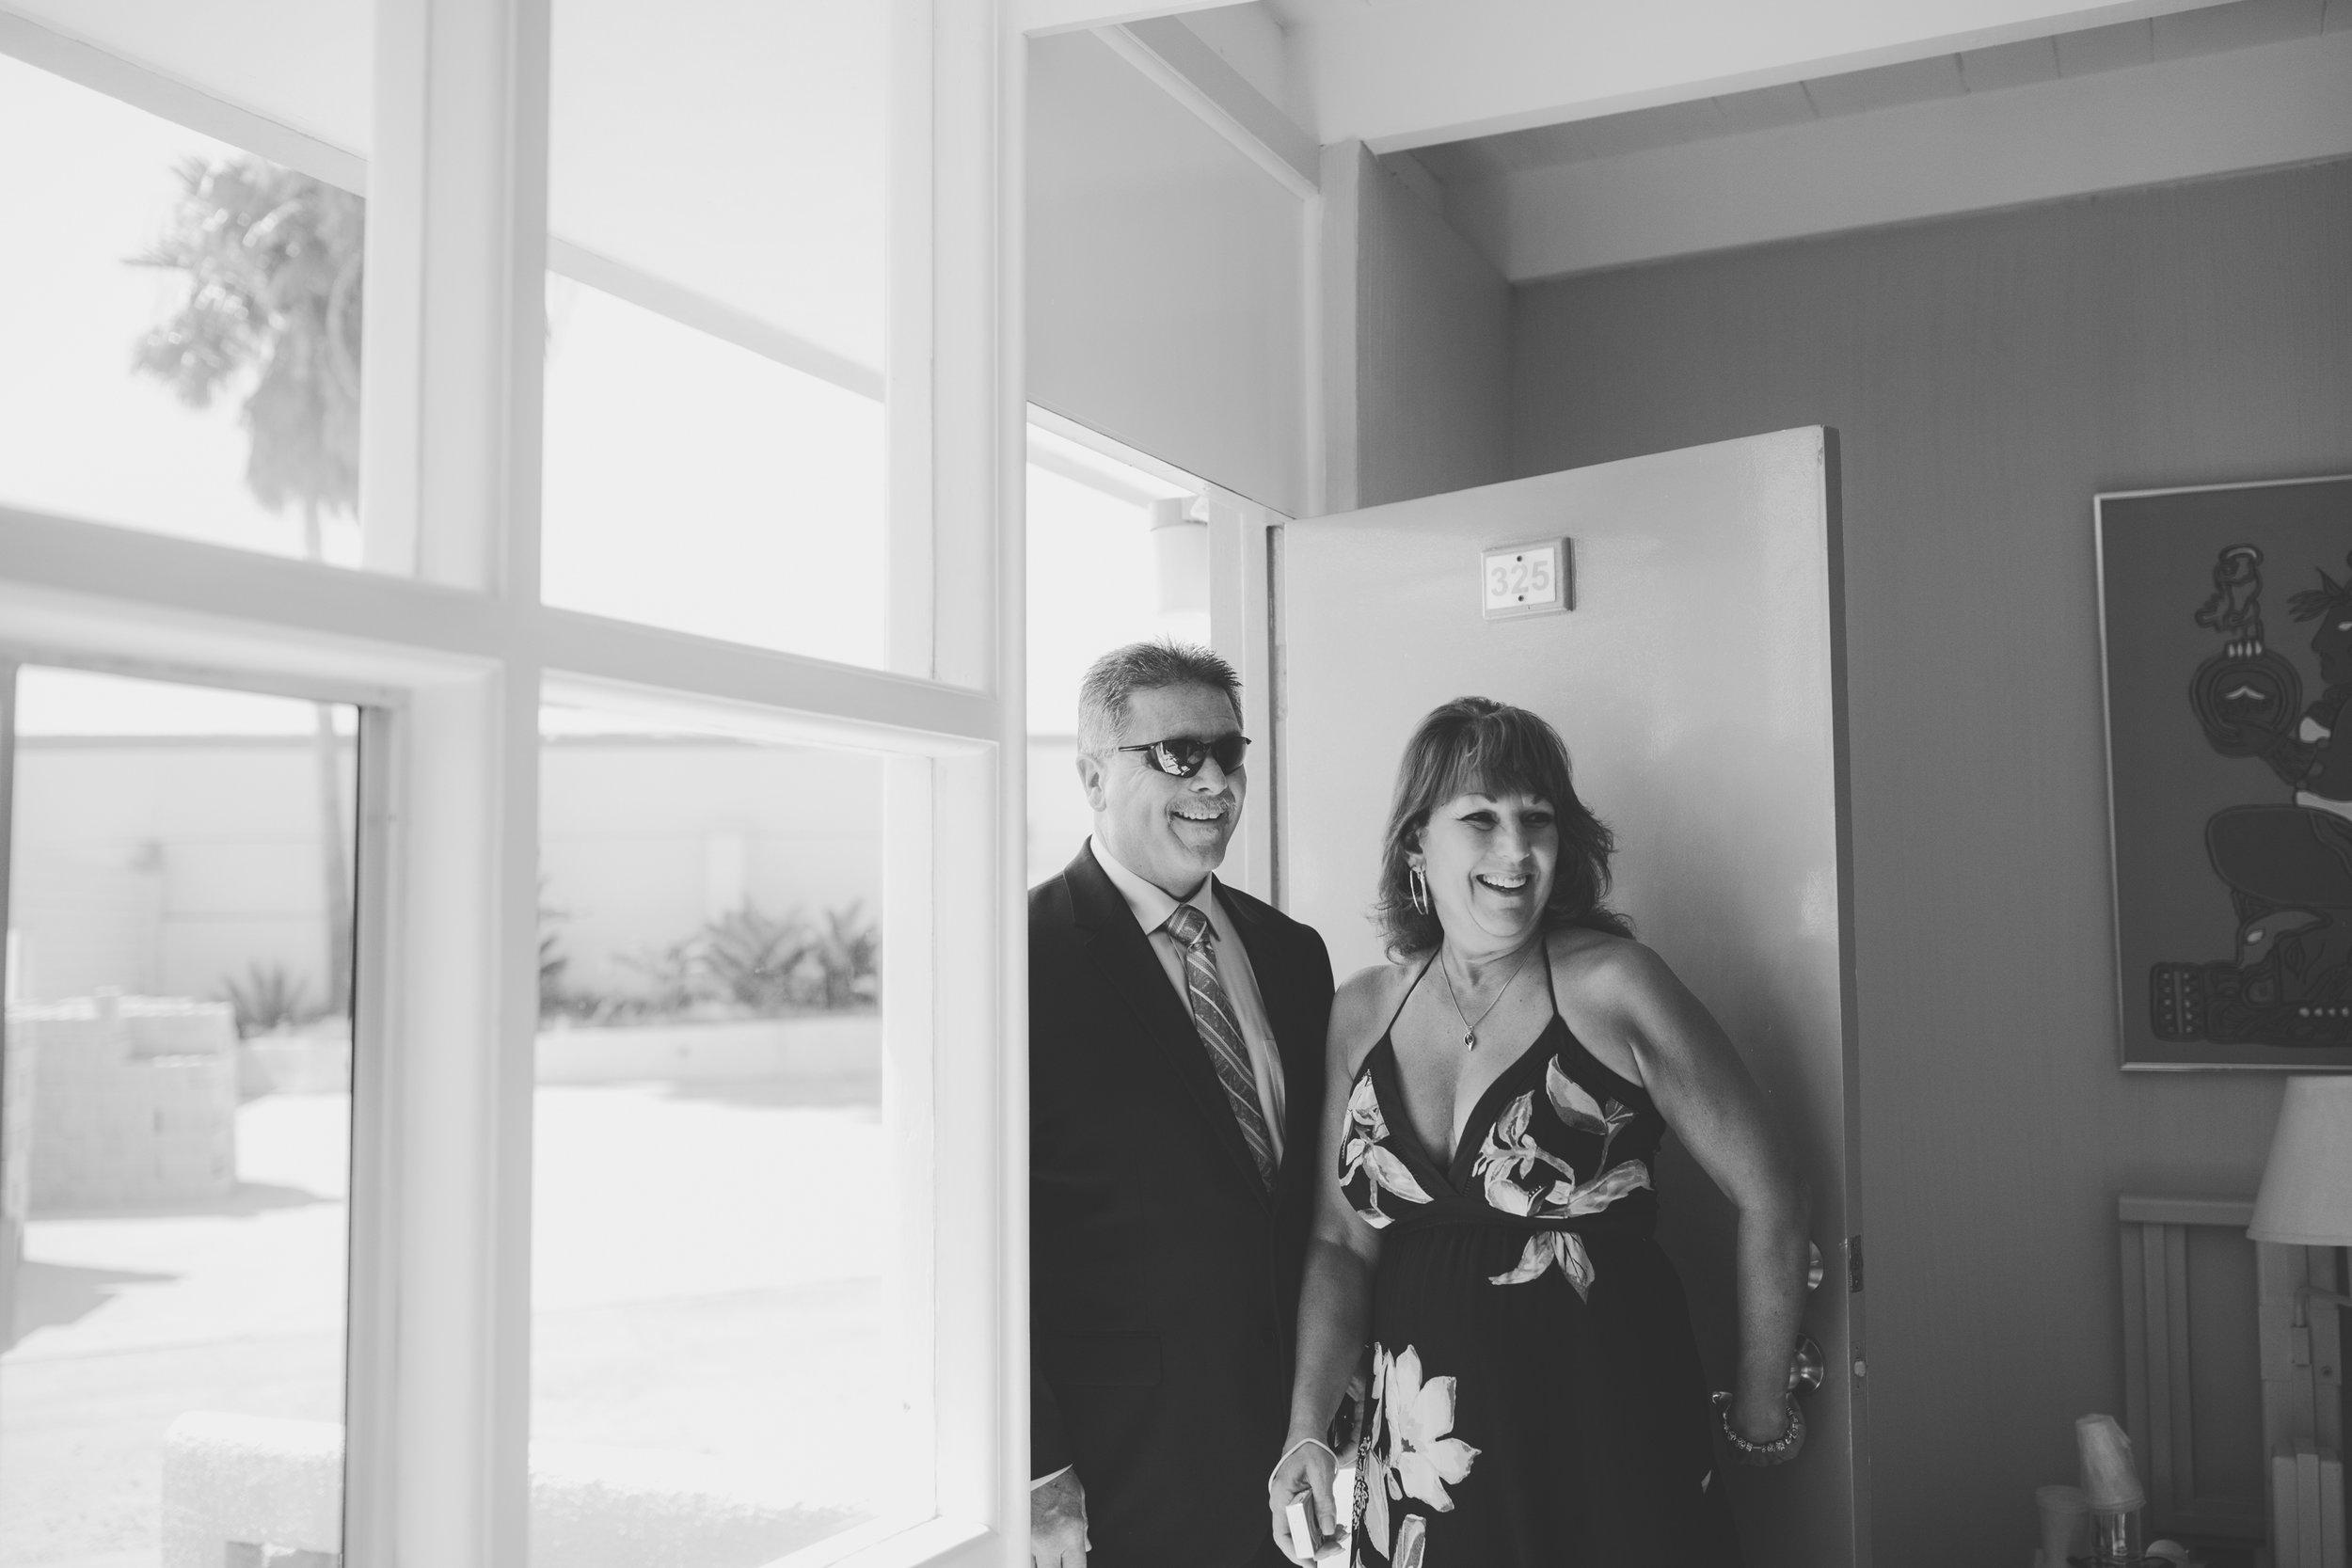 amandavanvels_ensenada_mexico_wedding_024.jpg